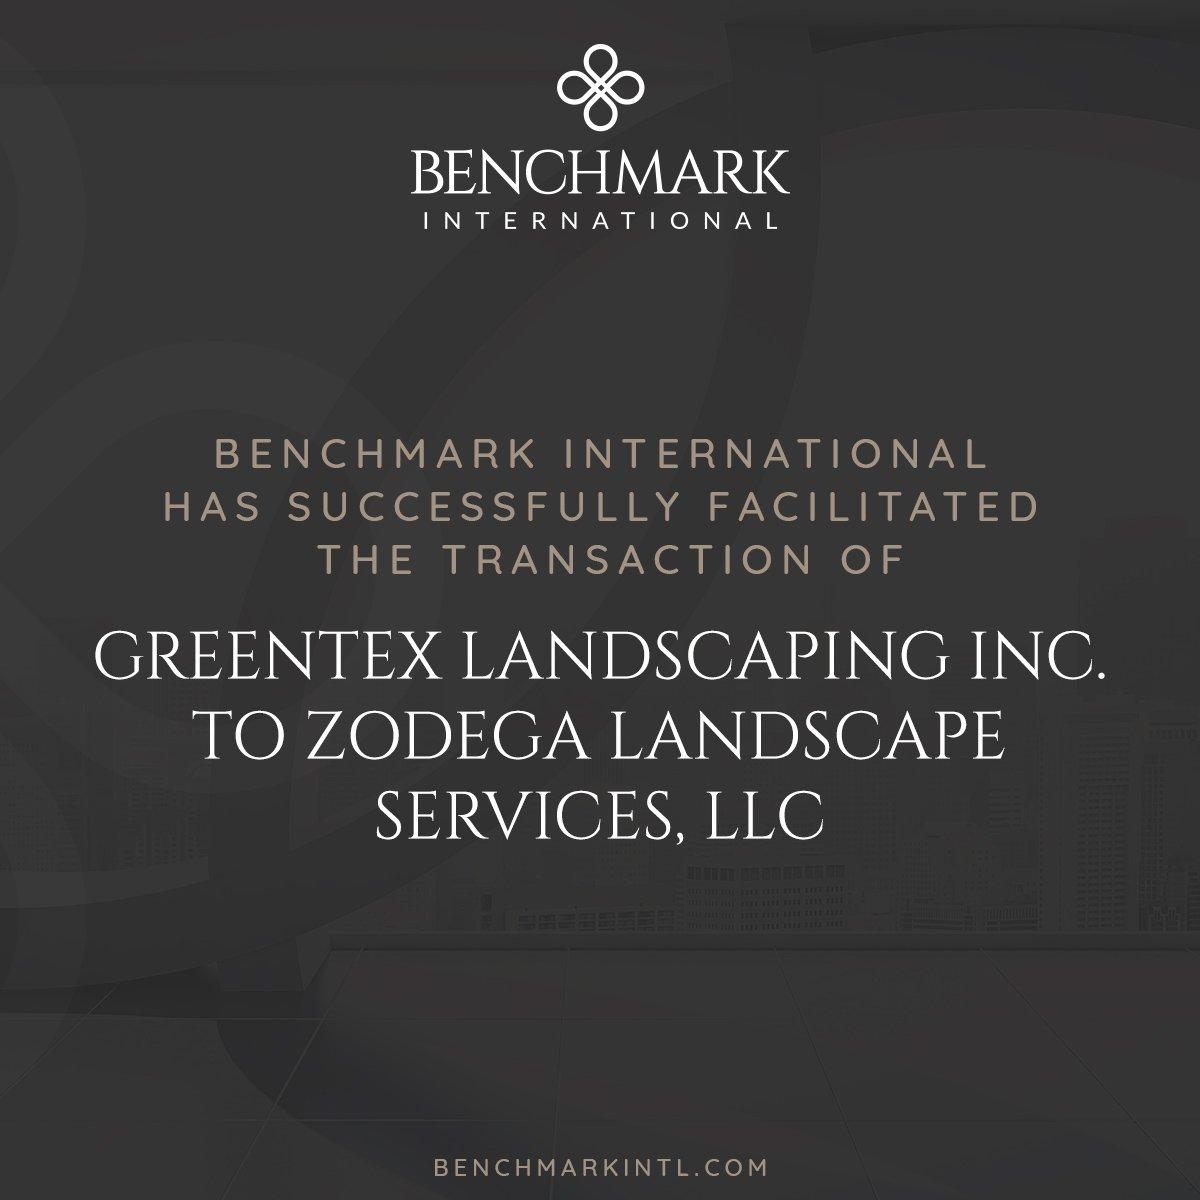 GreenTex_Landscaping_Inc._and-_Zodega_Landscape_Services,-LLC_Social (1)